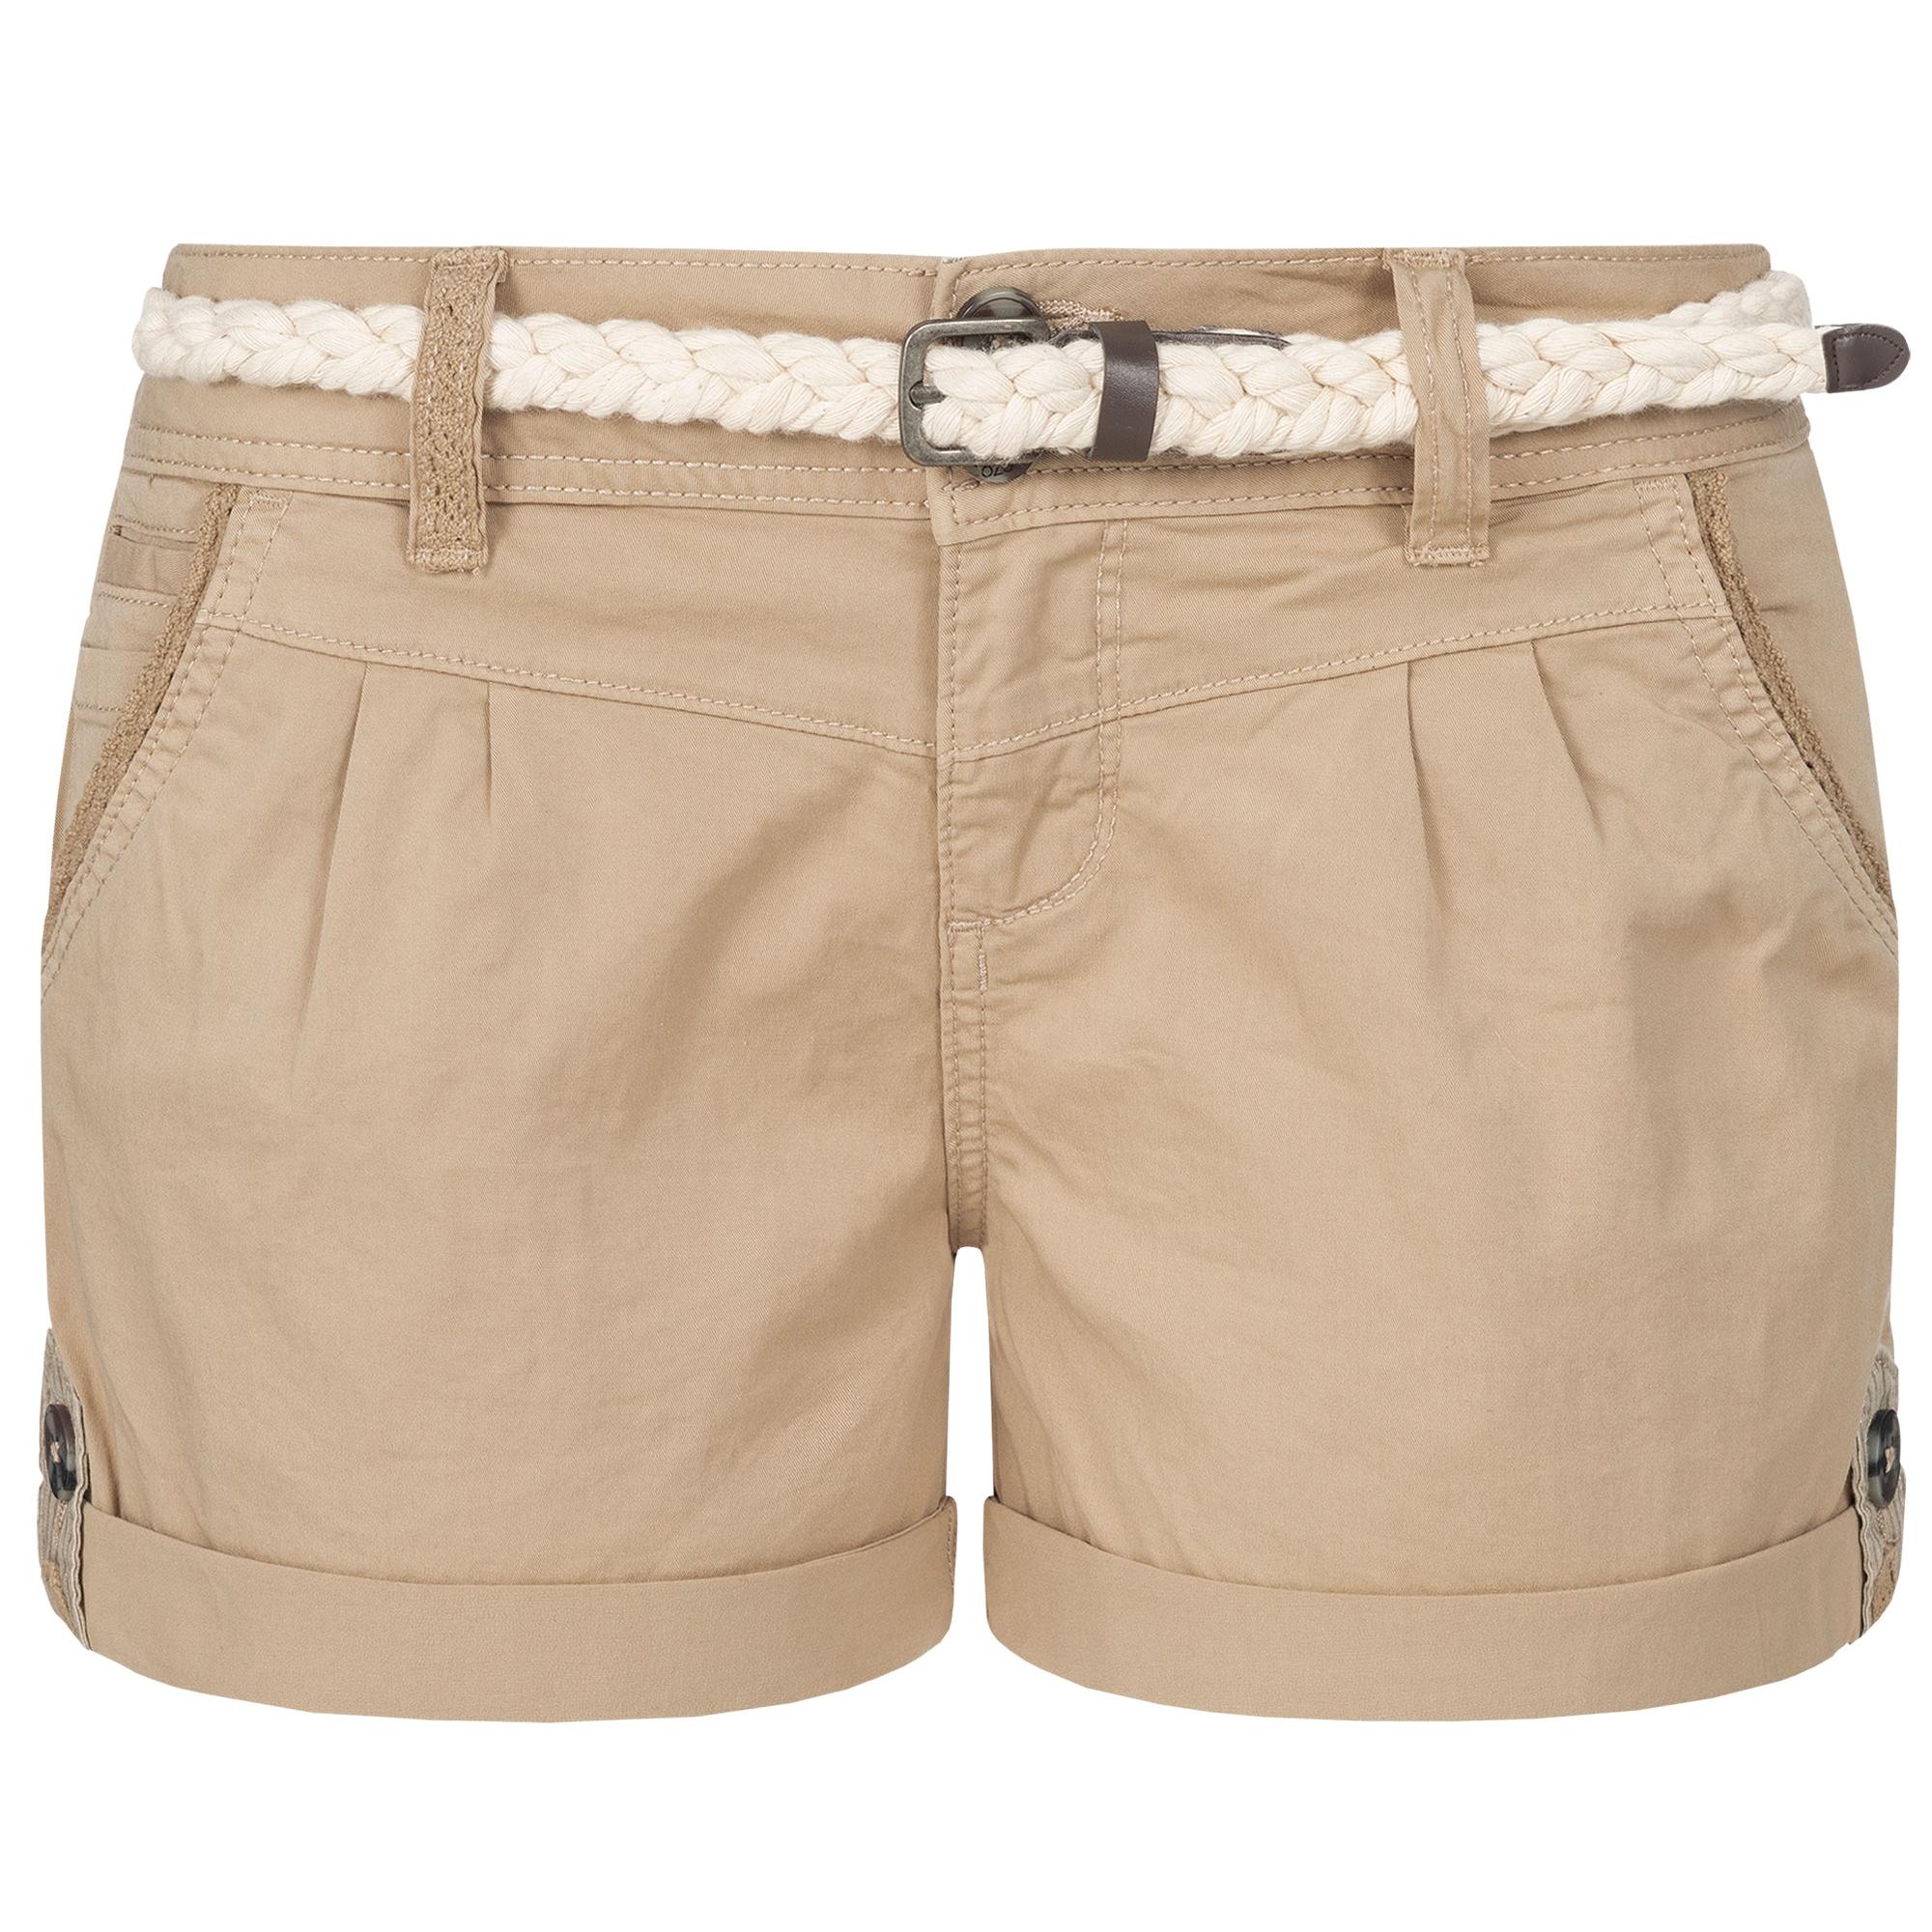 Indexbild 24 - Eight2Nine Damen Chino Bermuda Stretch Shorts mit Flecht Gürtel Hotpants